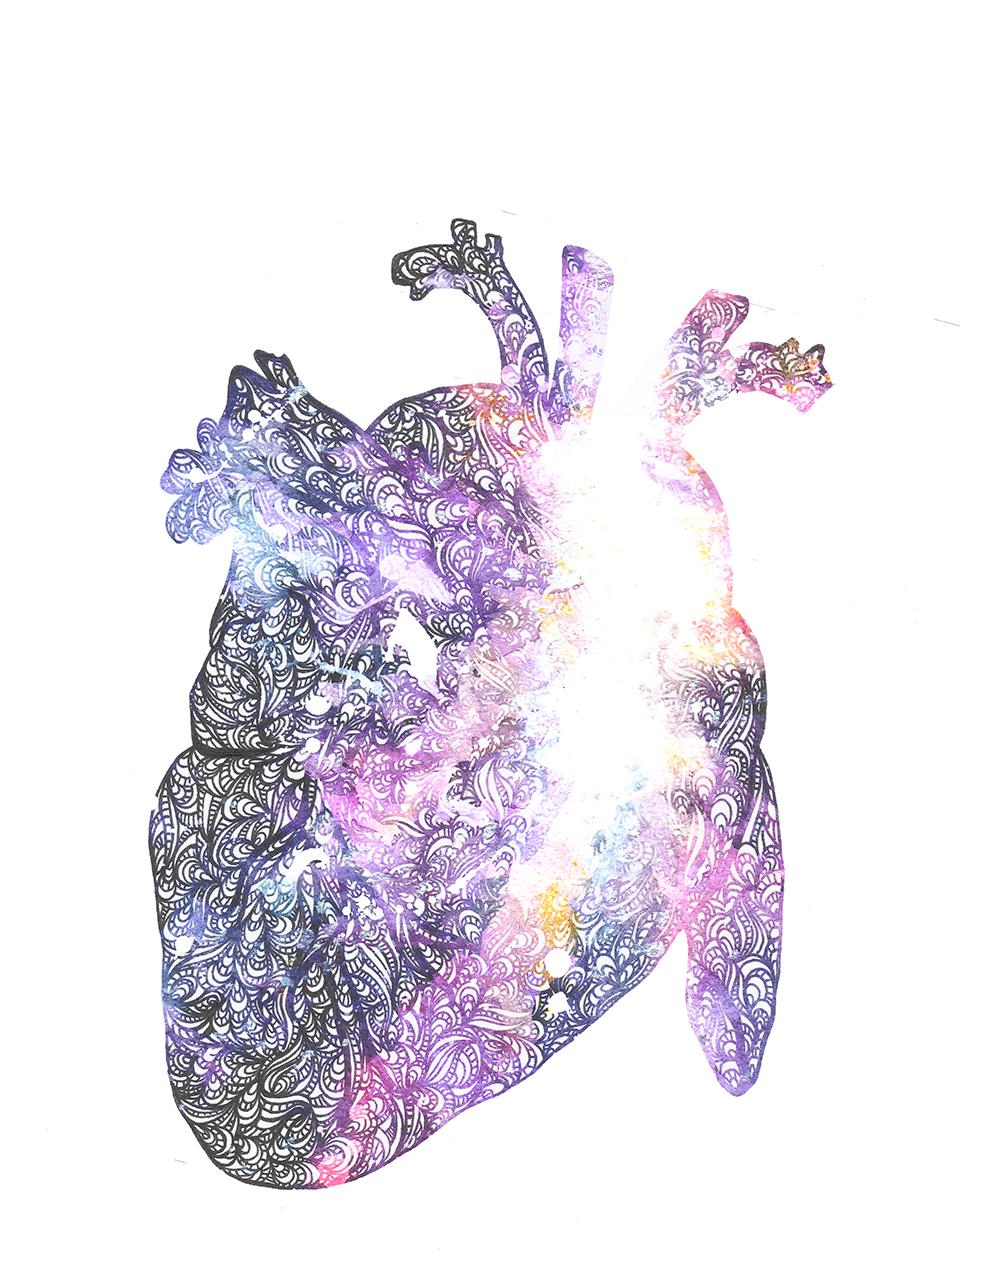 mnc_anatomyart02